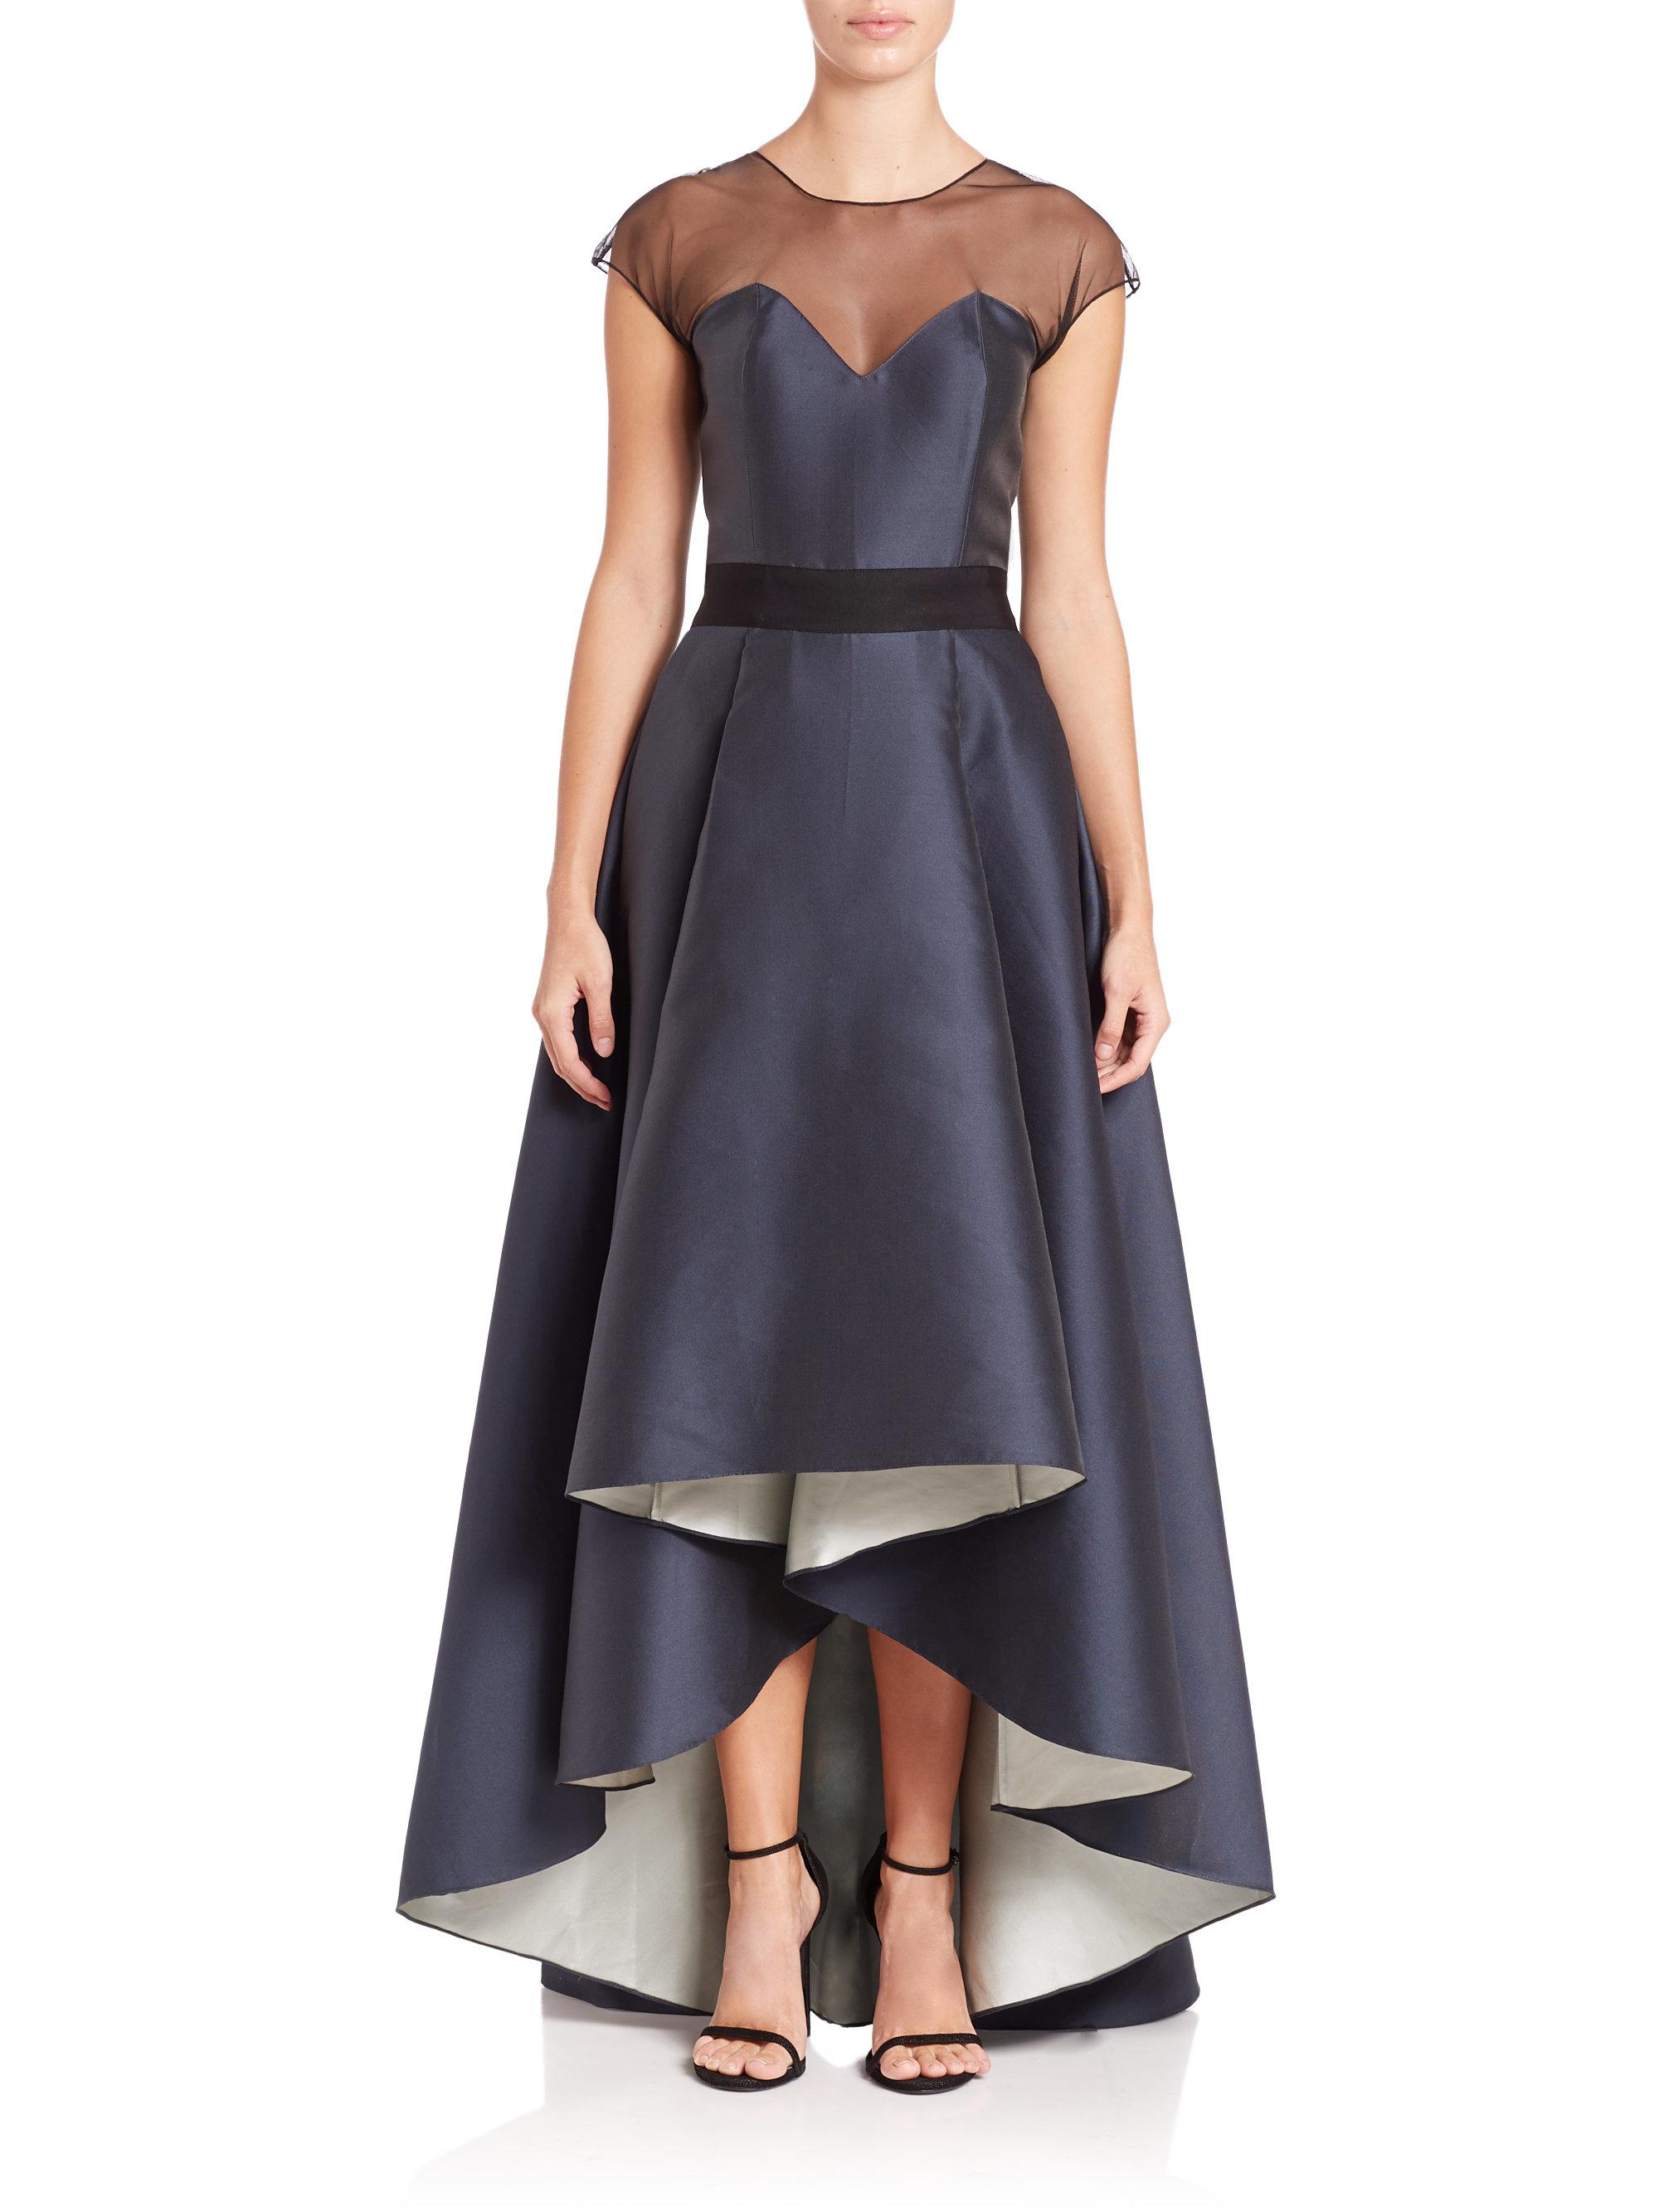 5f60294f0ba sachin-babi-noir-navy-lisa-gown-blue-product-2-945093920-normal.jpeg